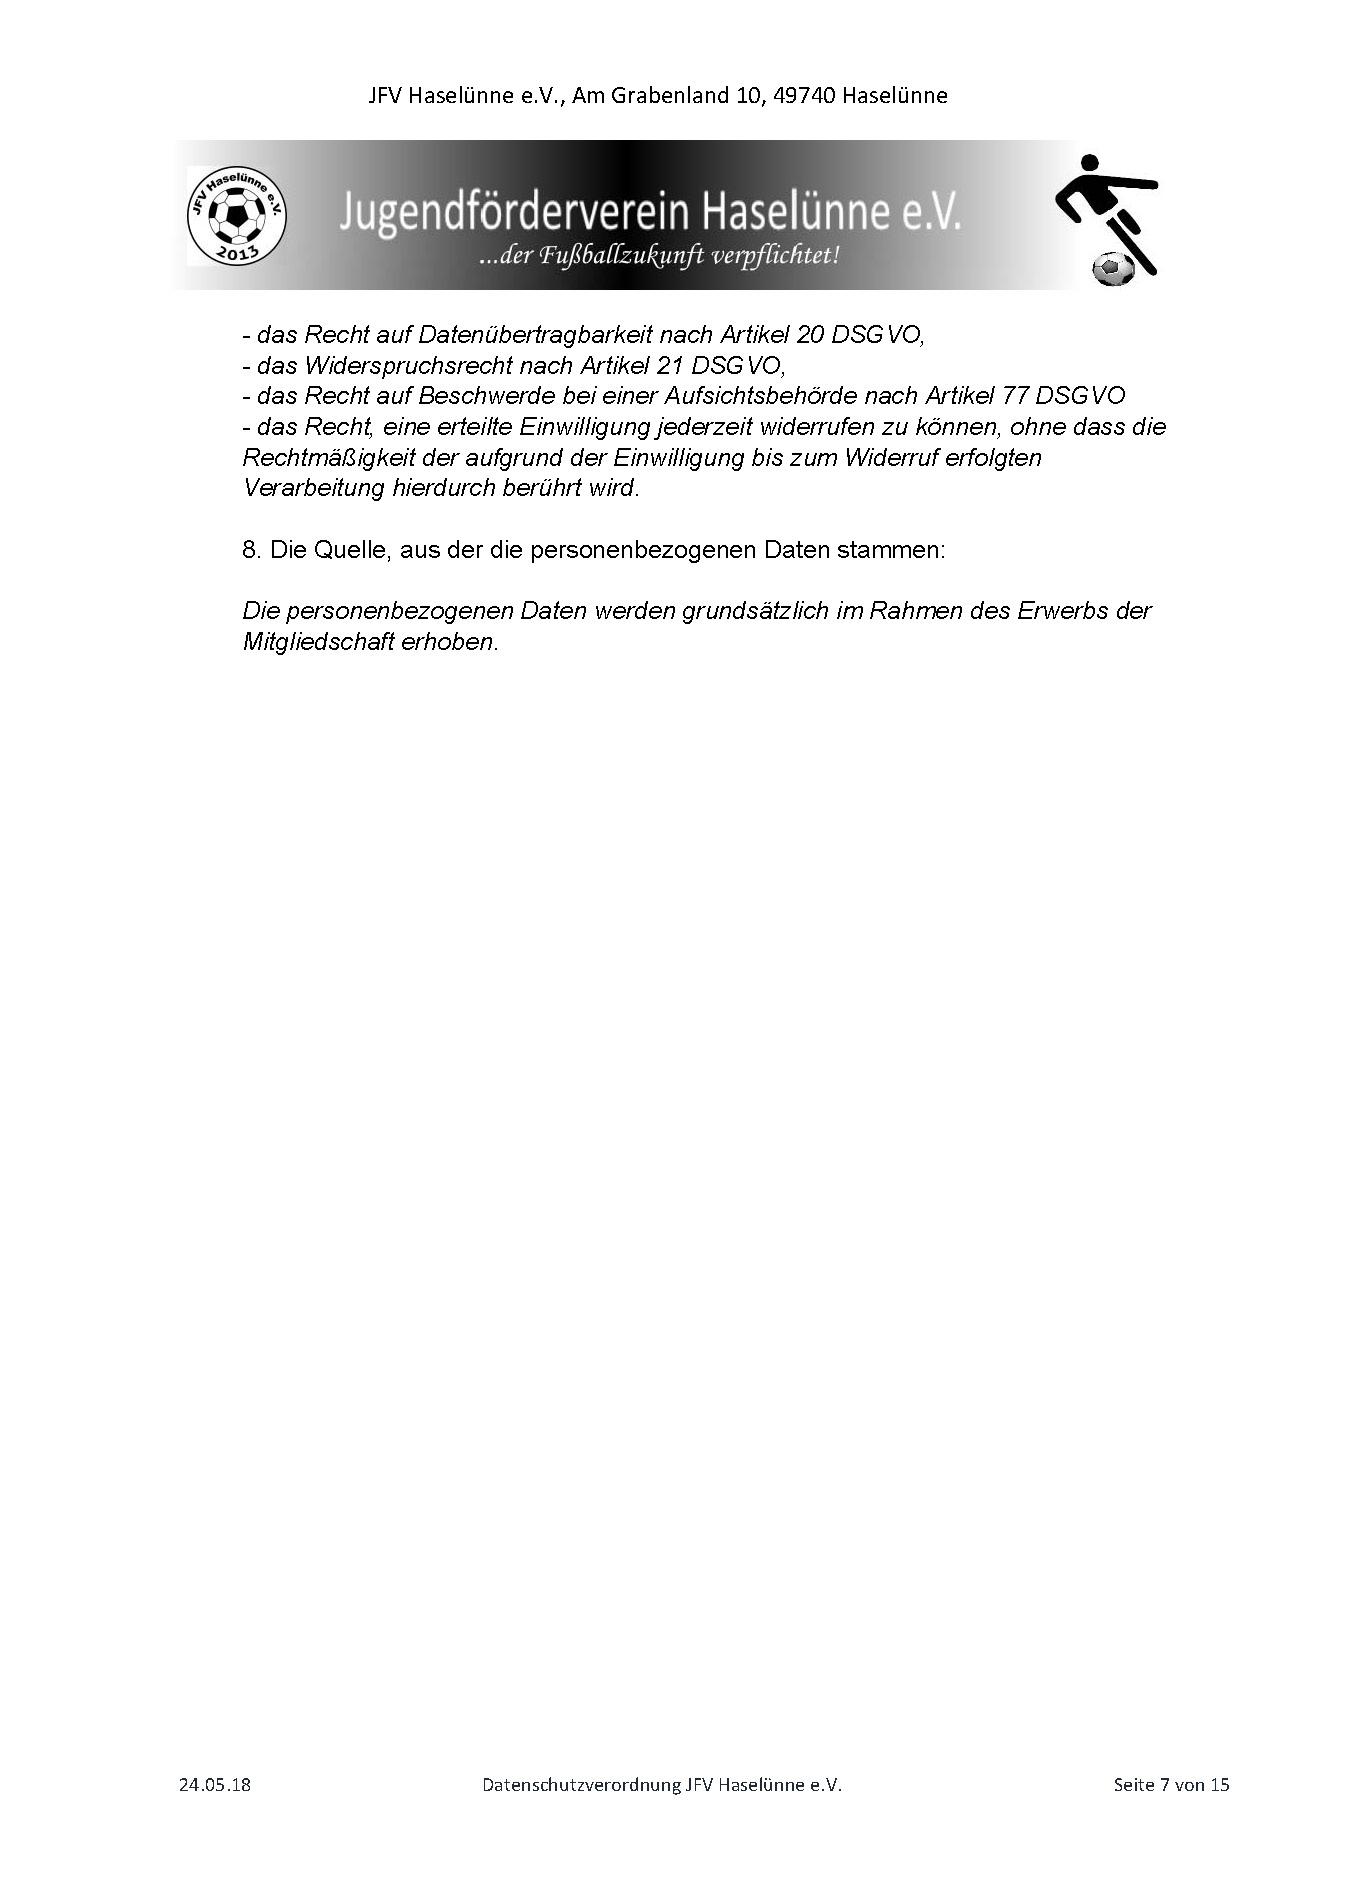 Erfreut Recht Und Ordnung Rahmen Ideen - Rahmen Ideen ...